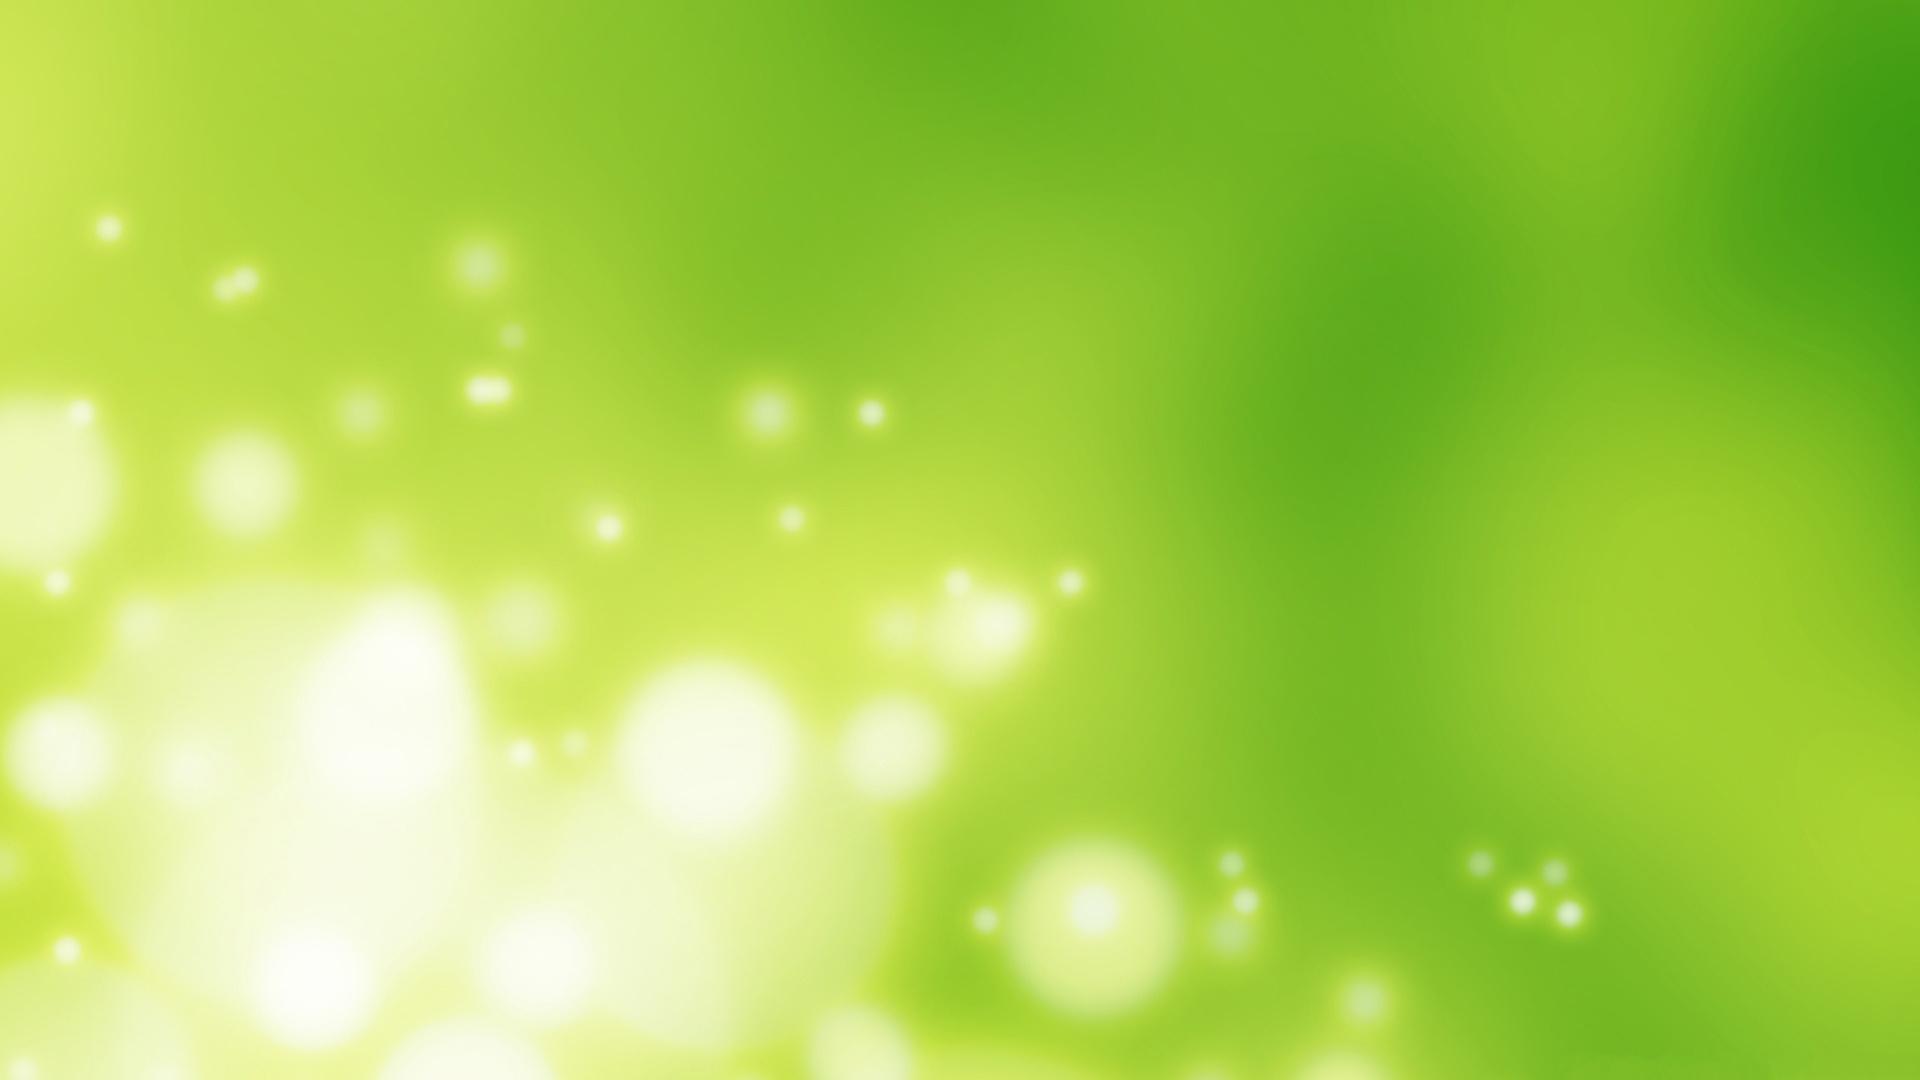 Fall Minimalist Wallpaper Lime Green Desktop Backgrounds Pixelstalk Net